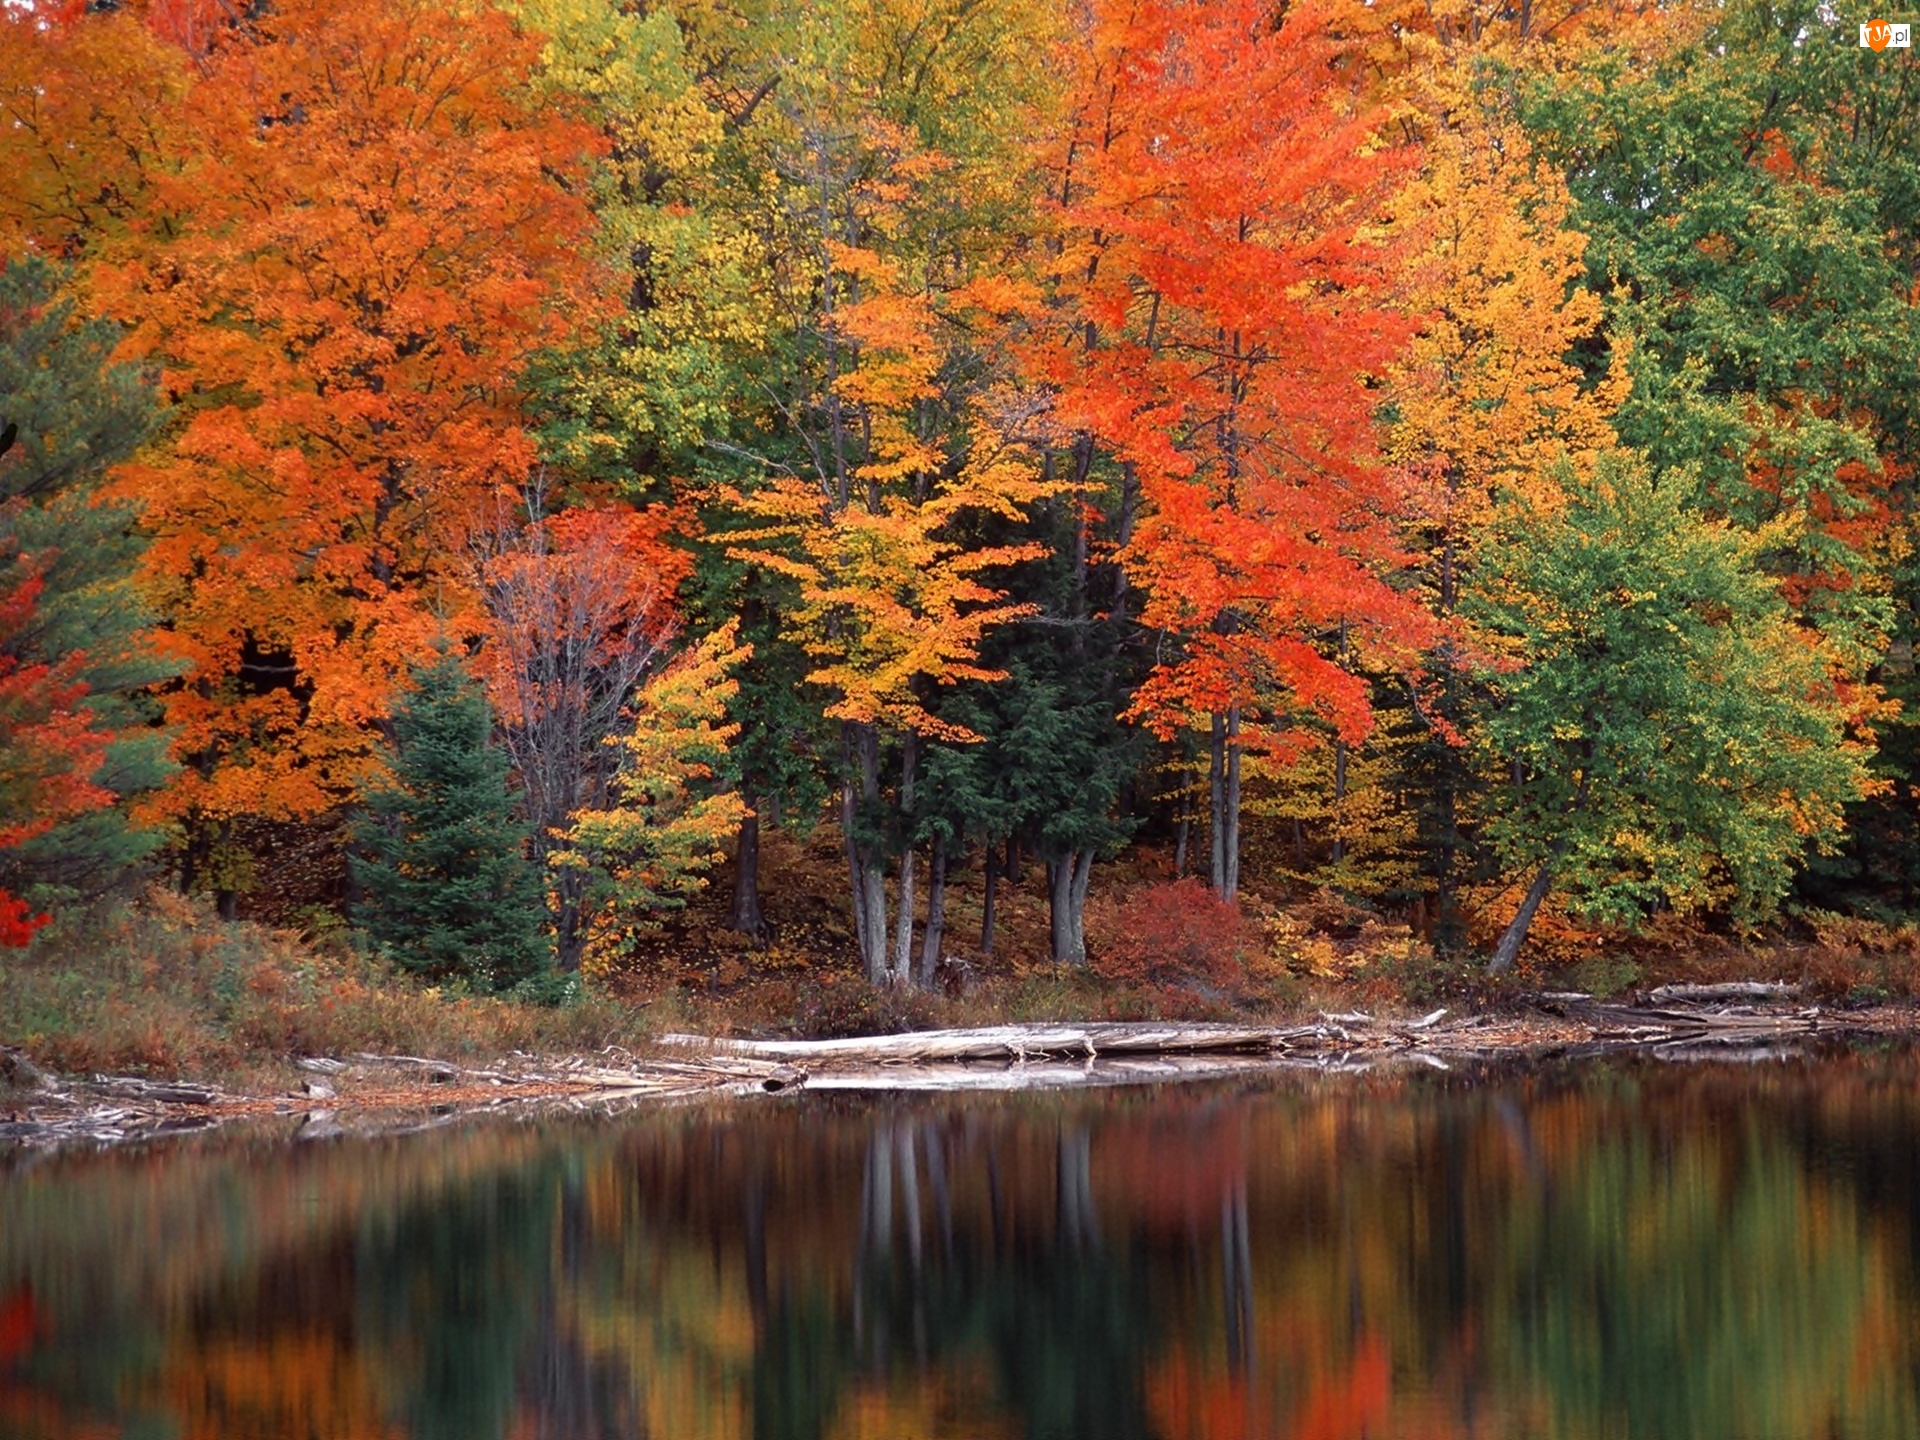 Kolorowe, Jeziorko, Drzewa, Las